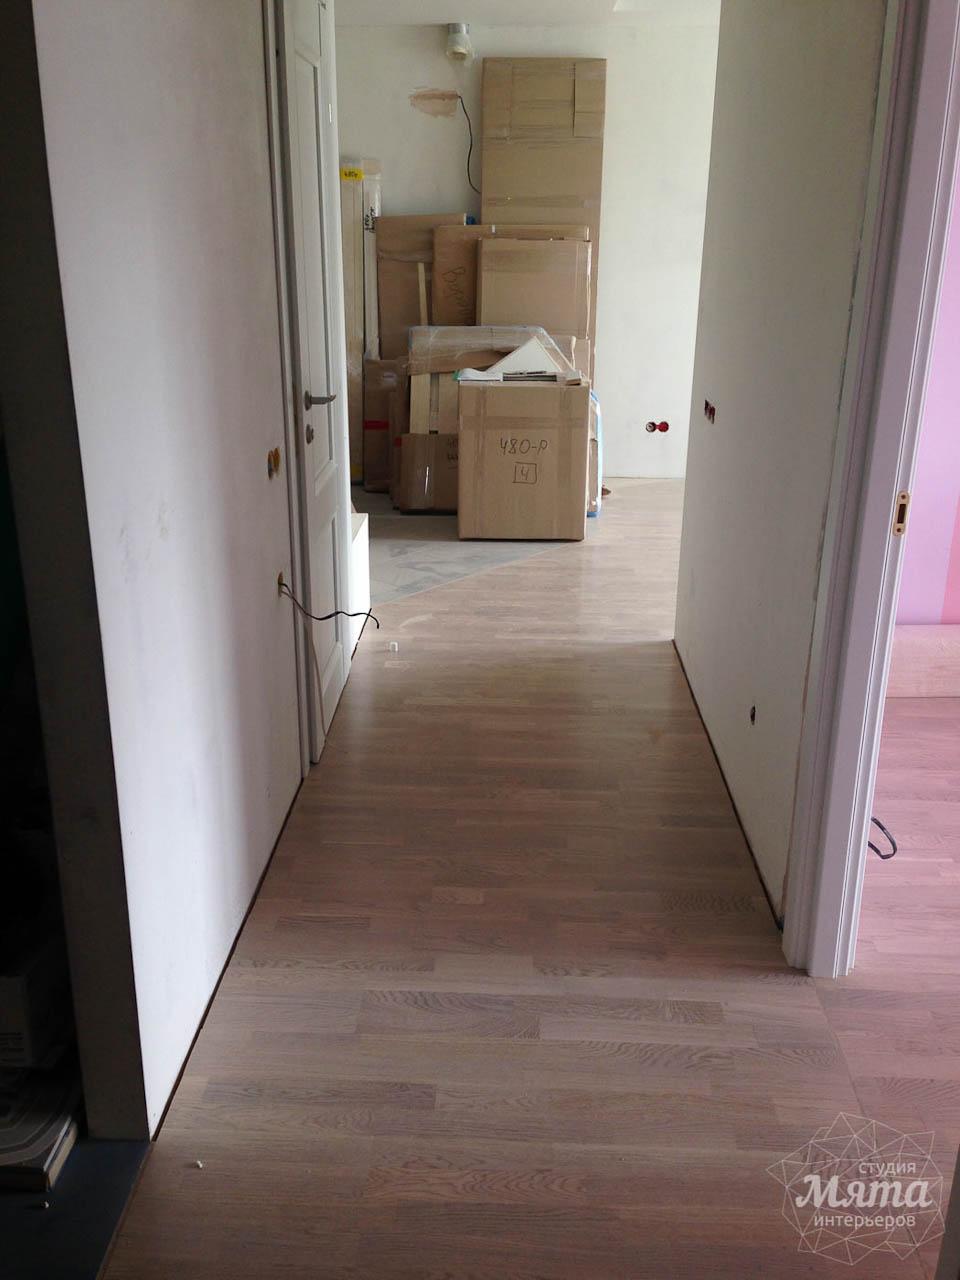 Дизайн интерьера и ремонт трехкомнатной квартиры по ул. Фучика 9 58